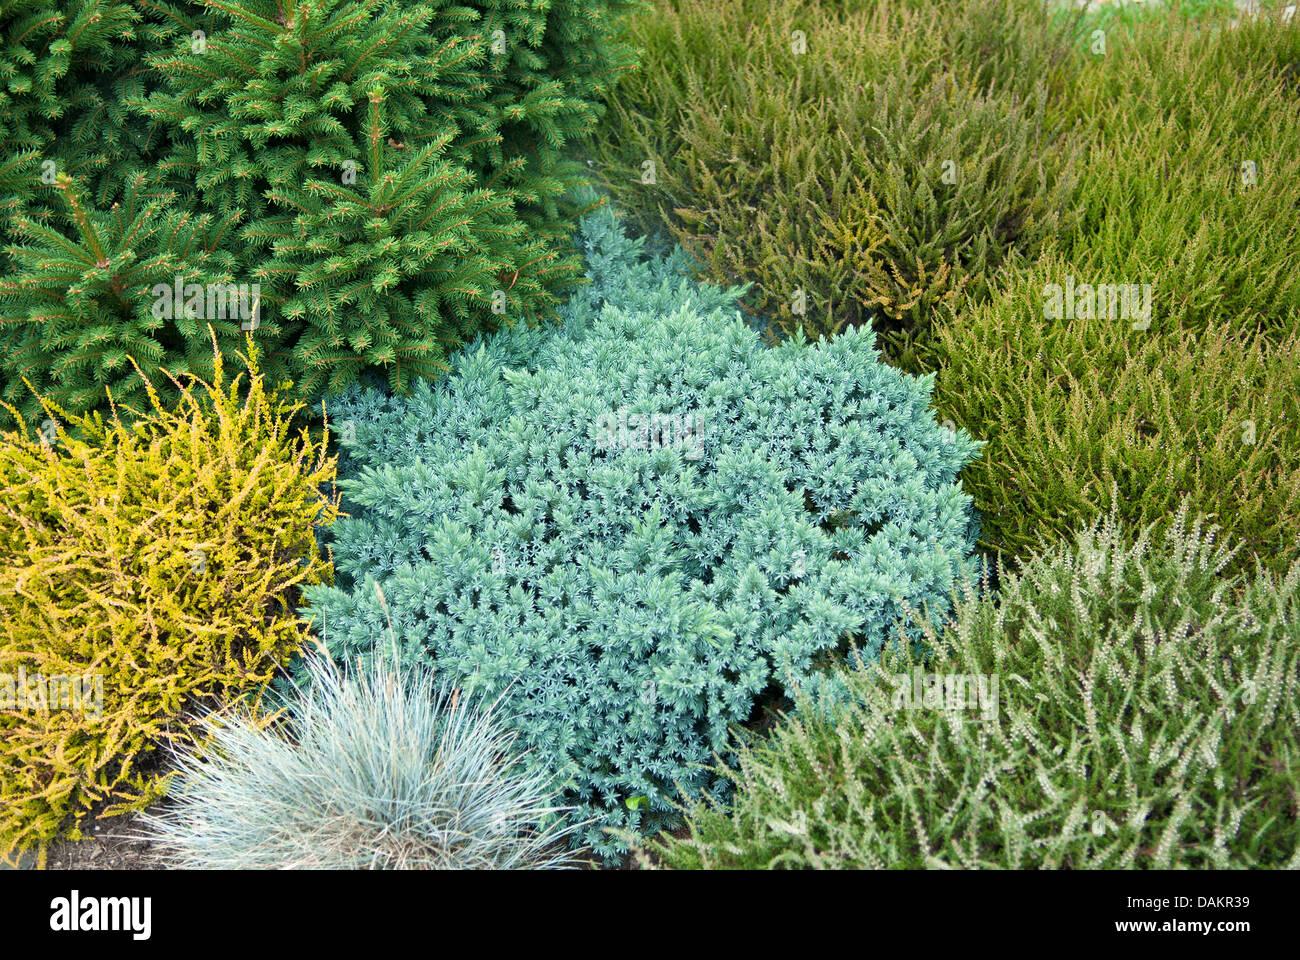 "Blue Star ginepro (Juniperus squamati 'Blue Star"", Juniperus squamati Blue Star), cultivar Blue star Immagini Stock"